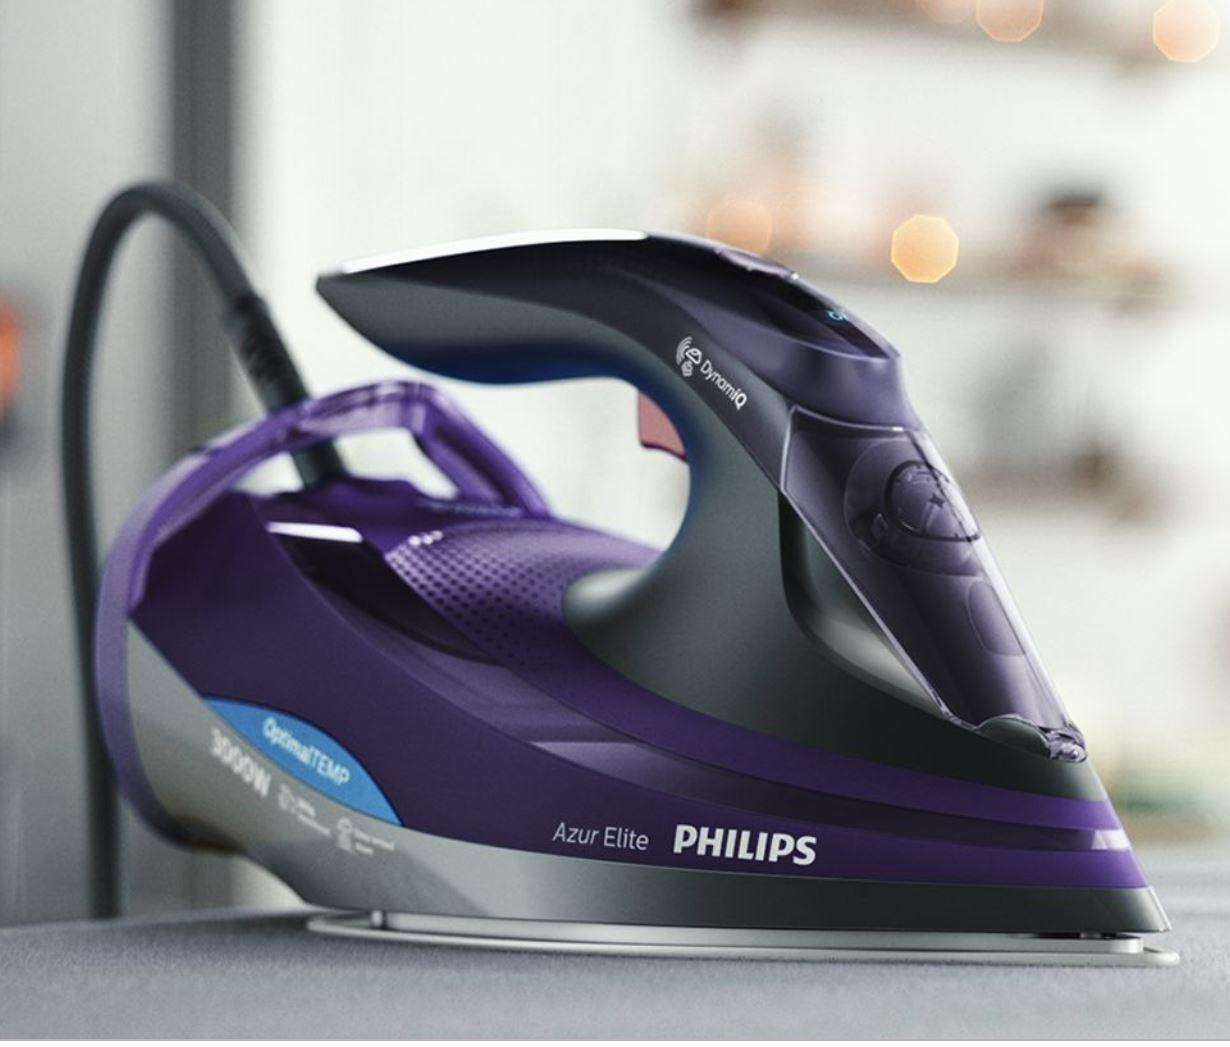 Philips Azur Elite Steam Iron With Optimaltemp Technology Gc5039/30 By Vipl Online.